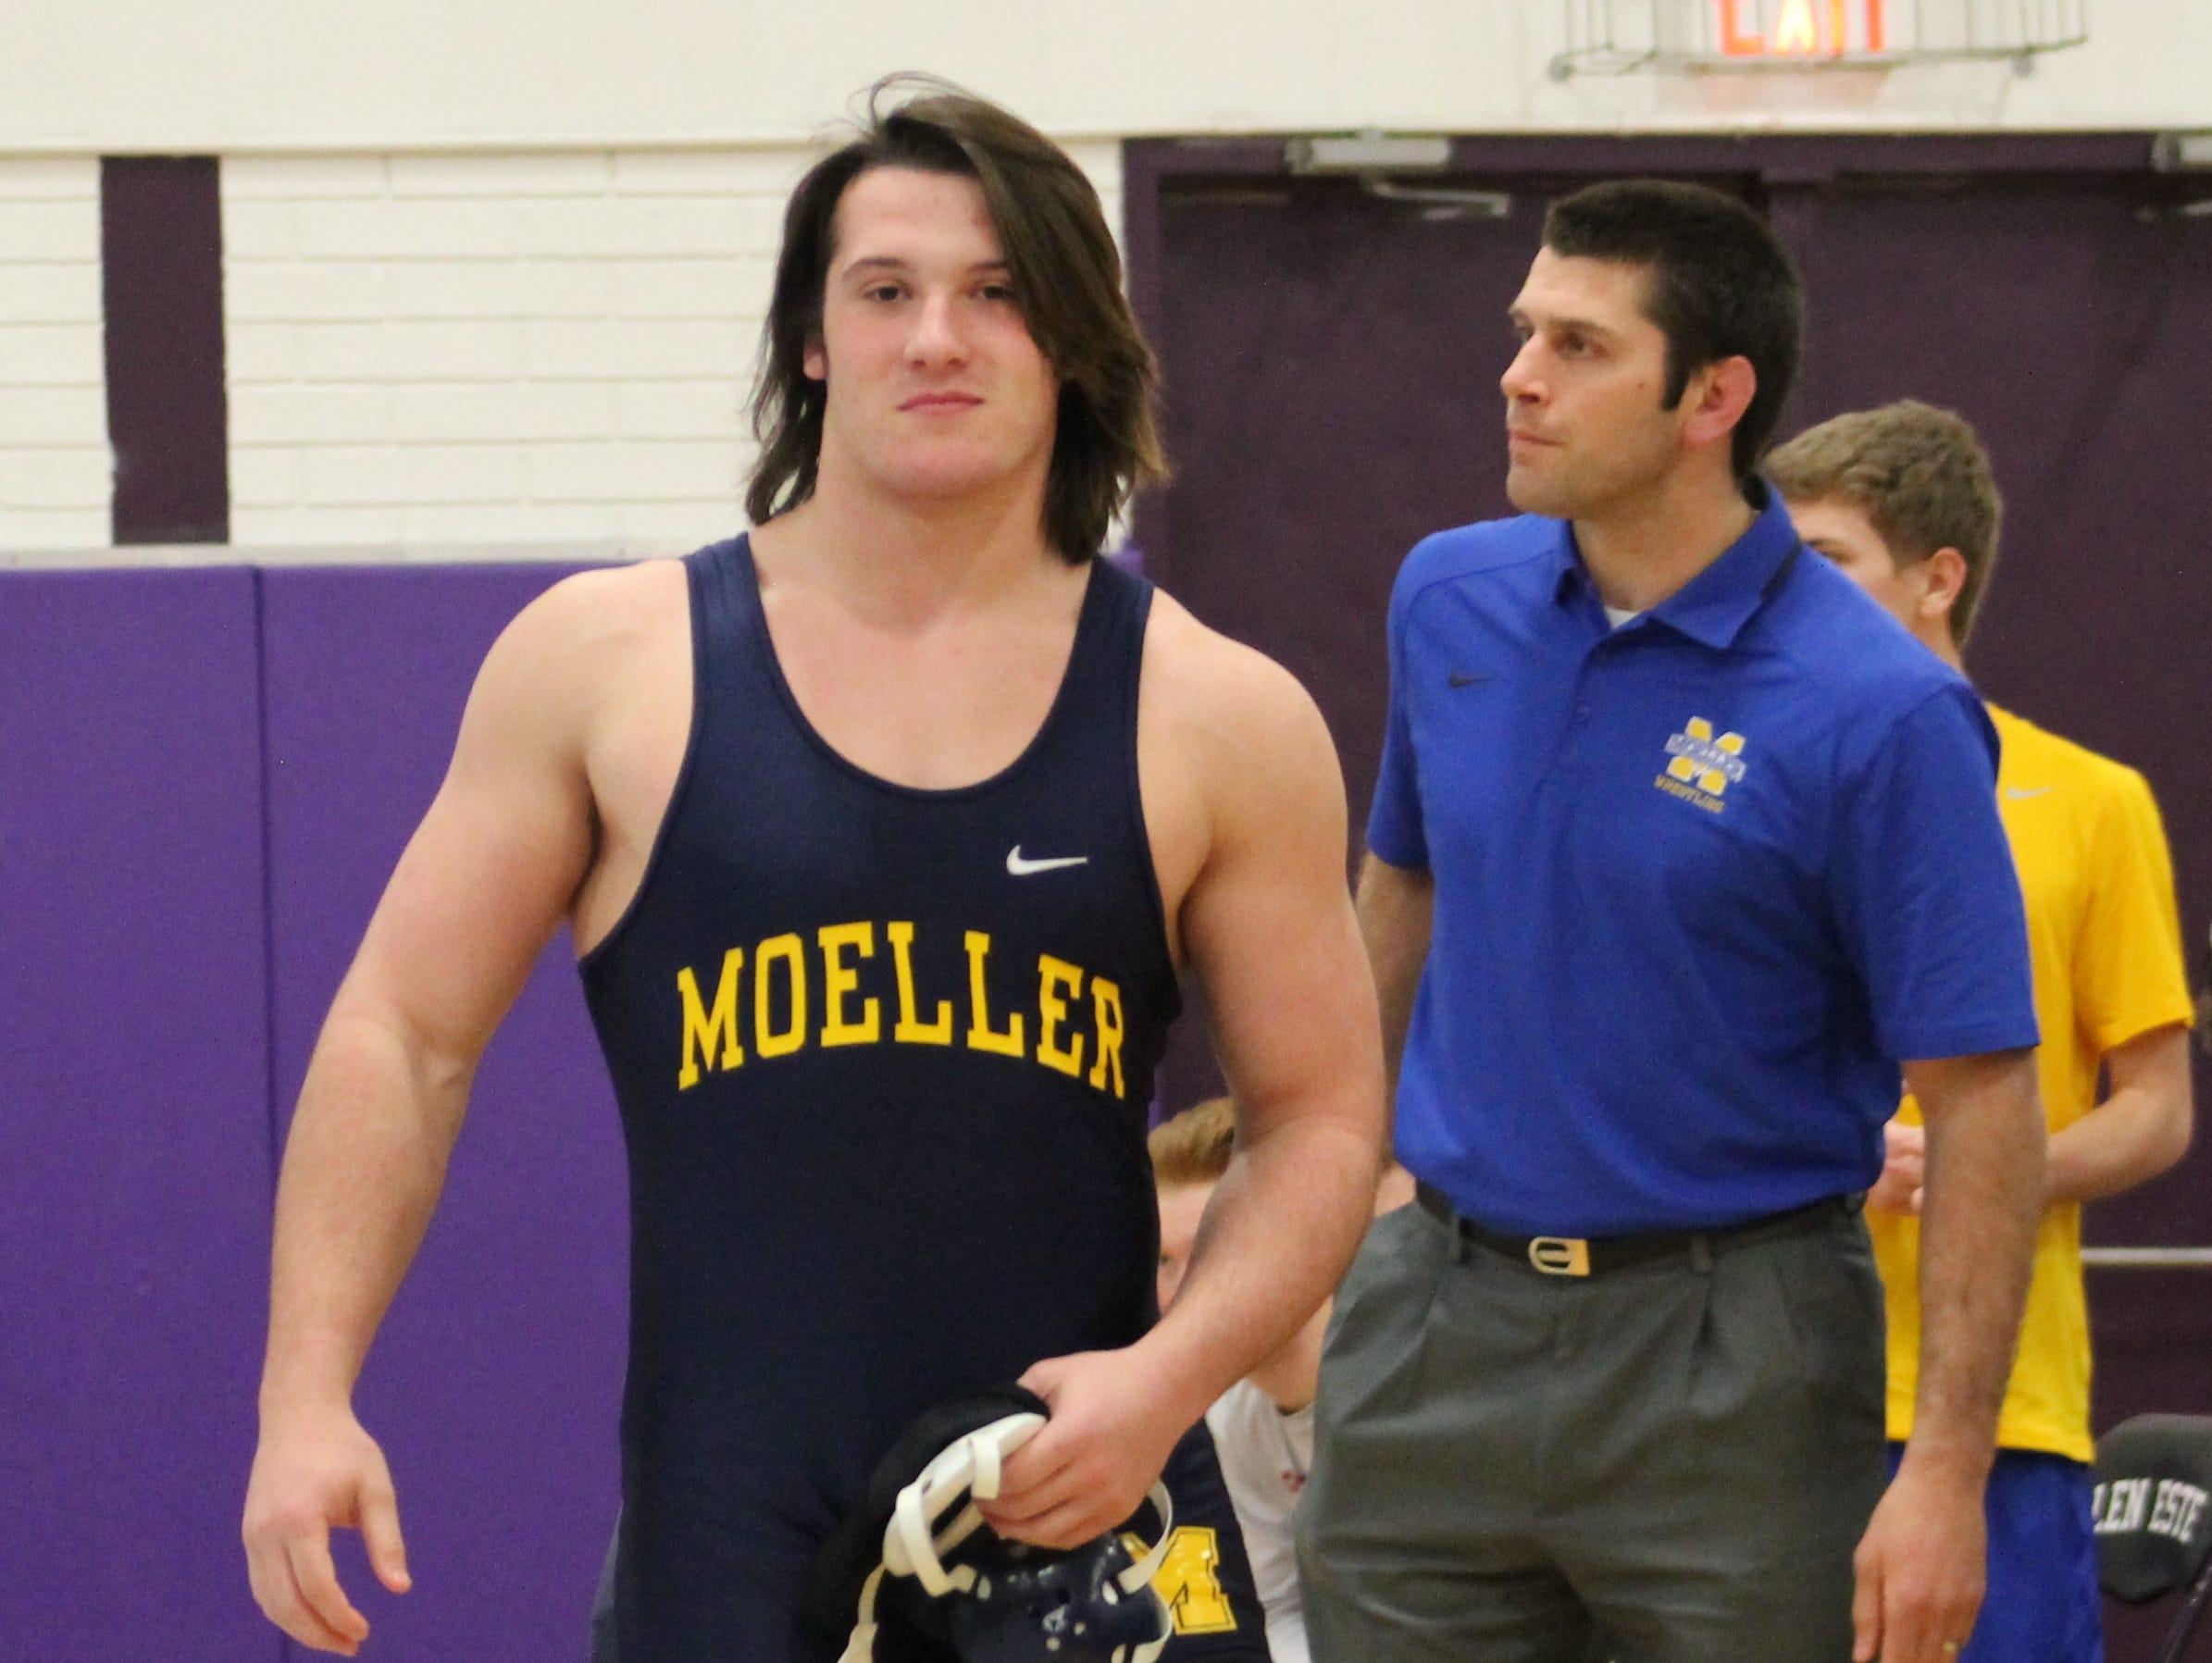 Moeller junior Jack Meyer smiles after victory with his coach James Yonushonis behind him.